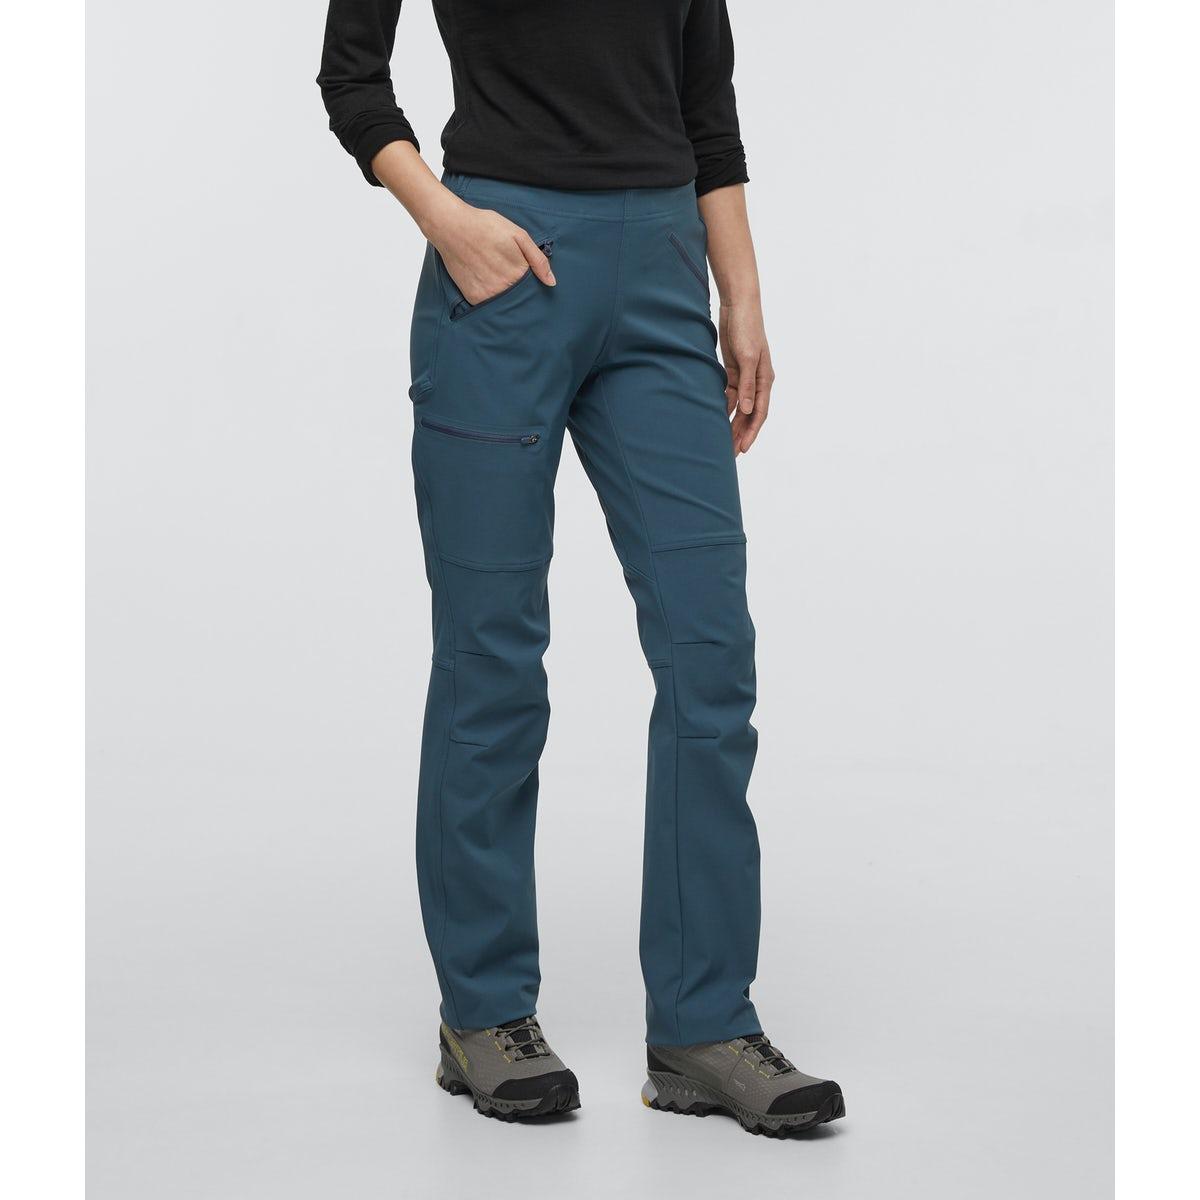 MEC Borderland Pants